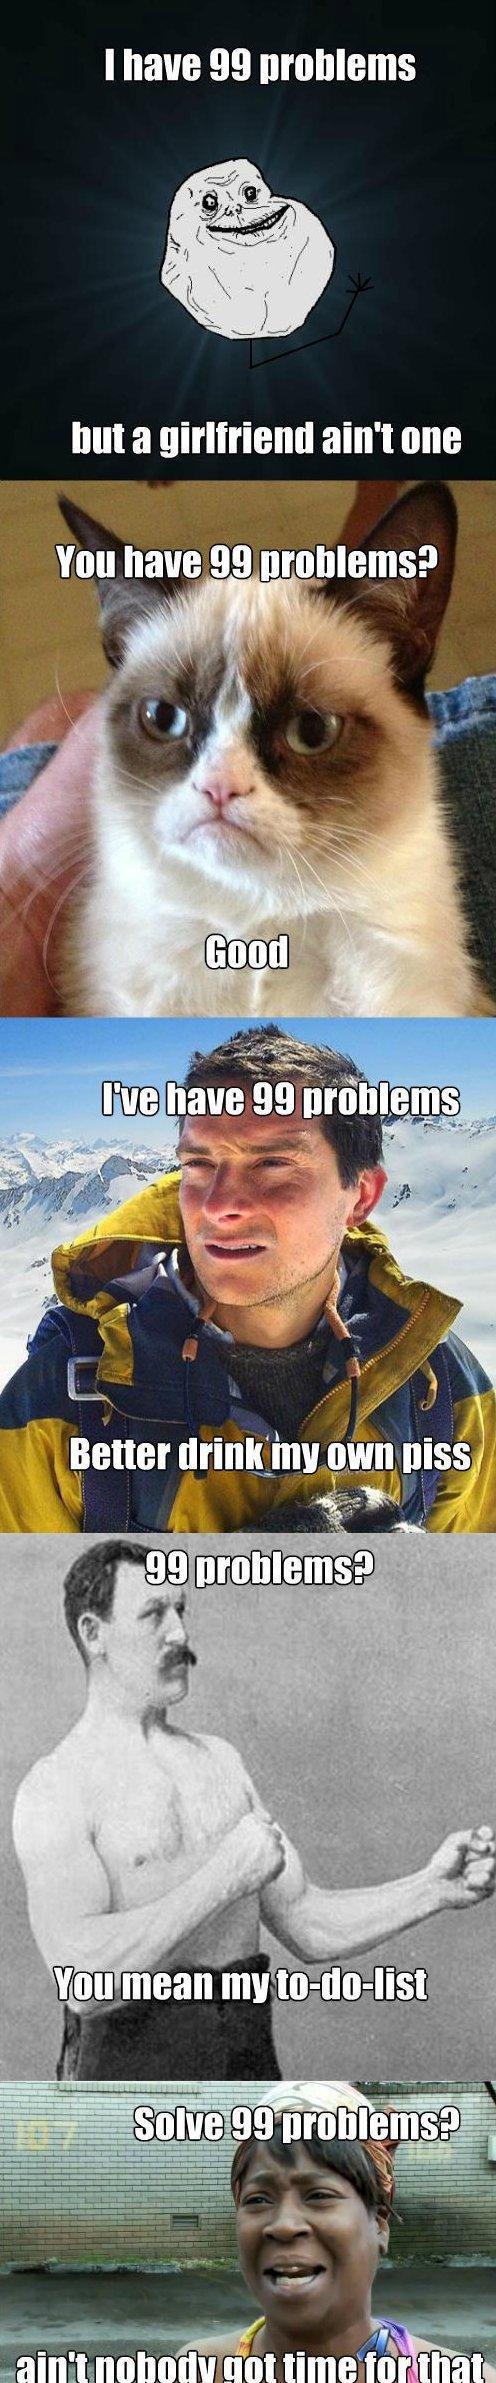 99 Problems